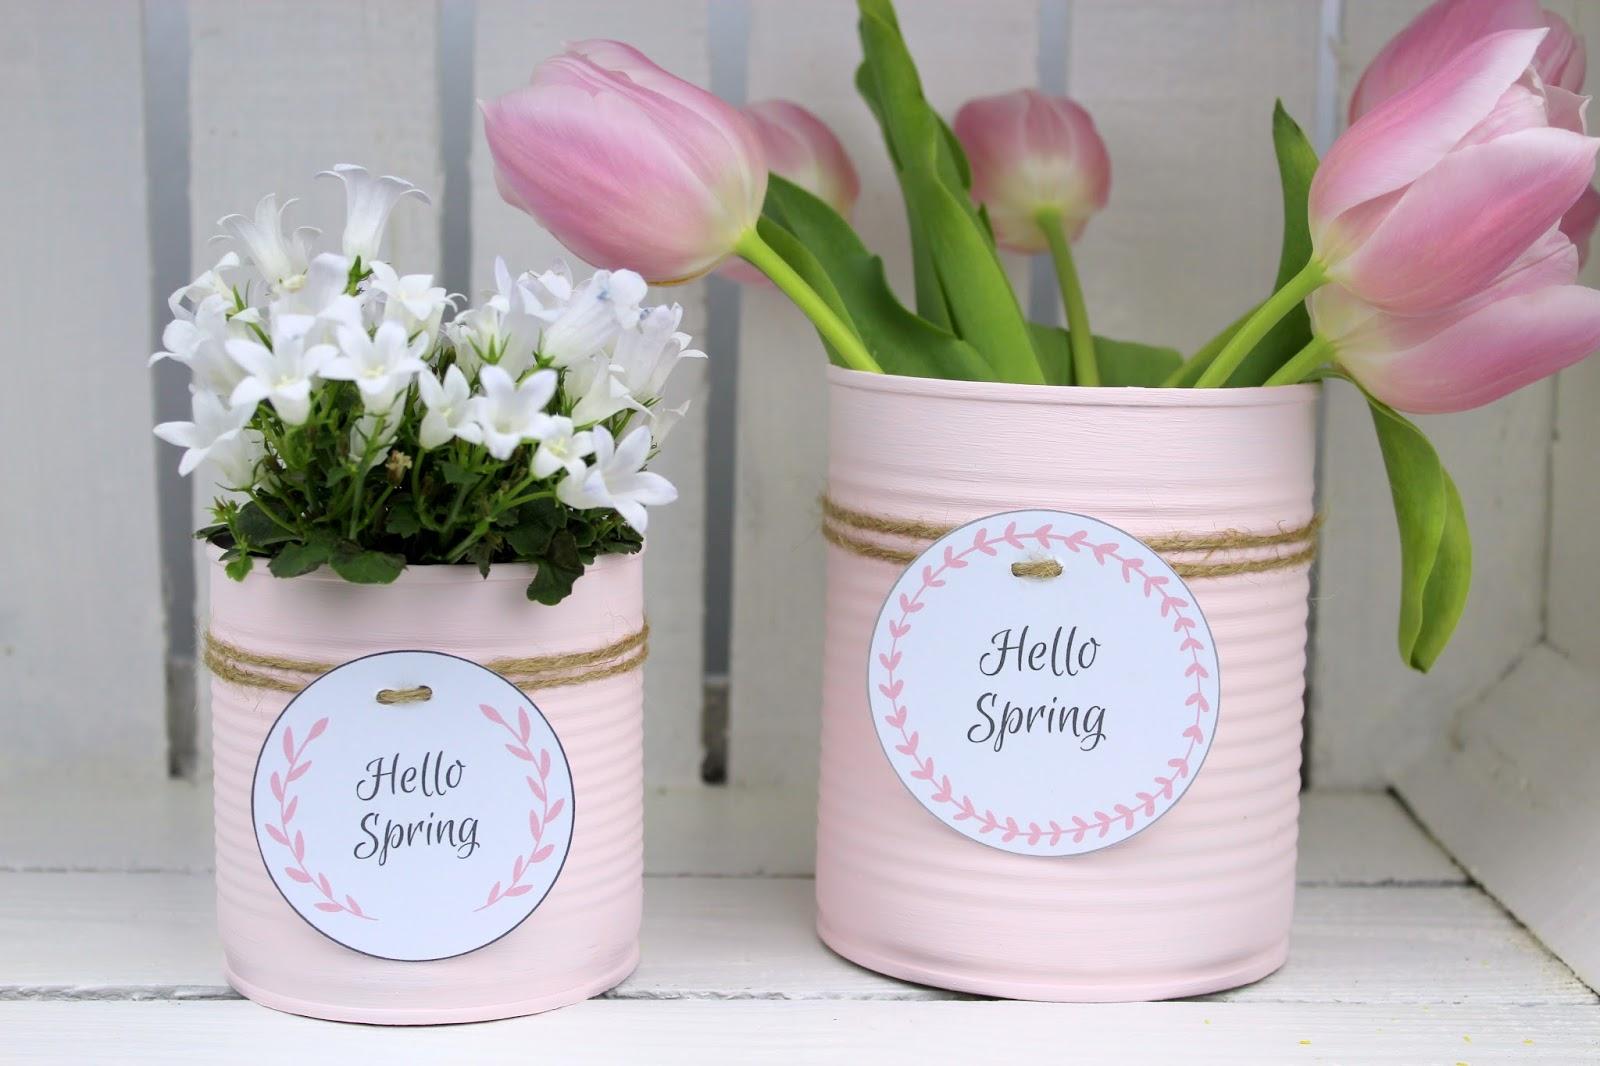 DIY Recycling Bastelidee: Blumentopf aus Konservendose in zartem rosa + kostenlosem Etikett